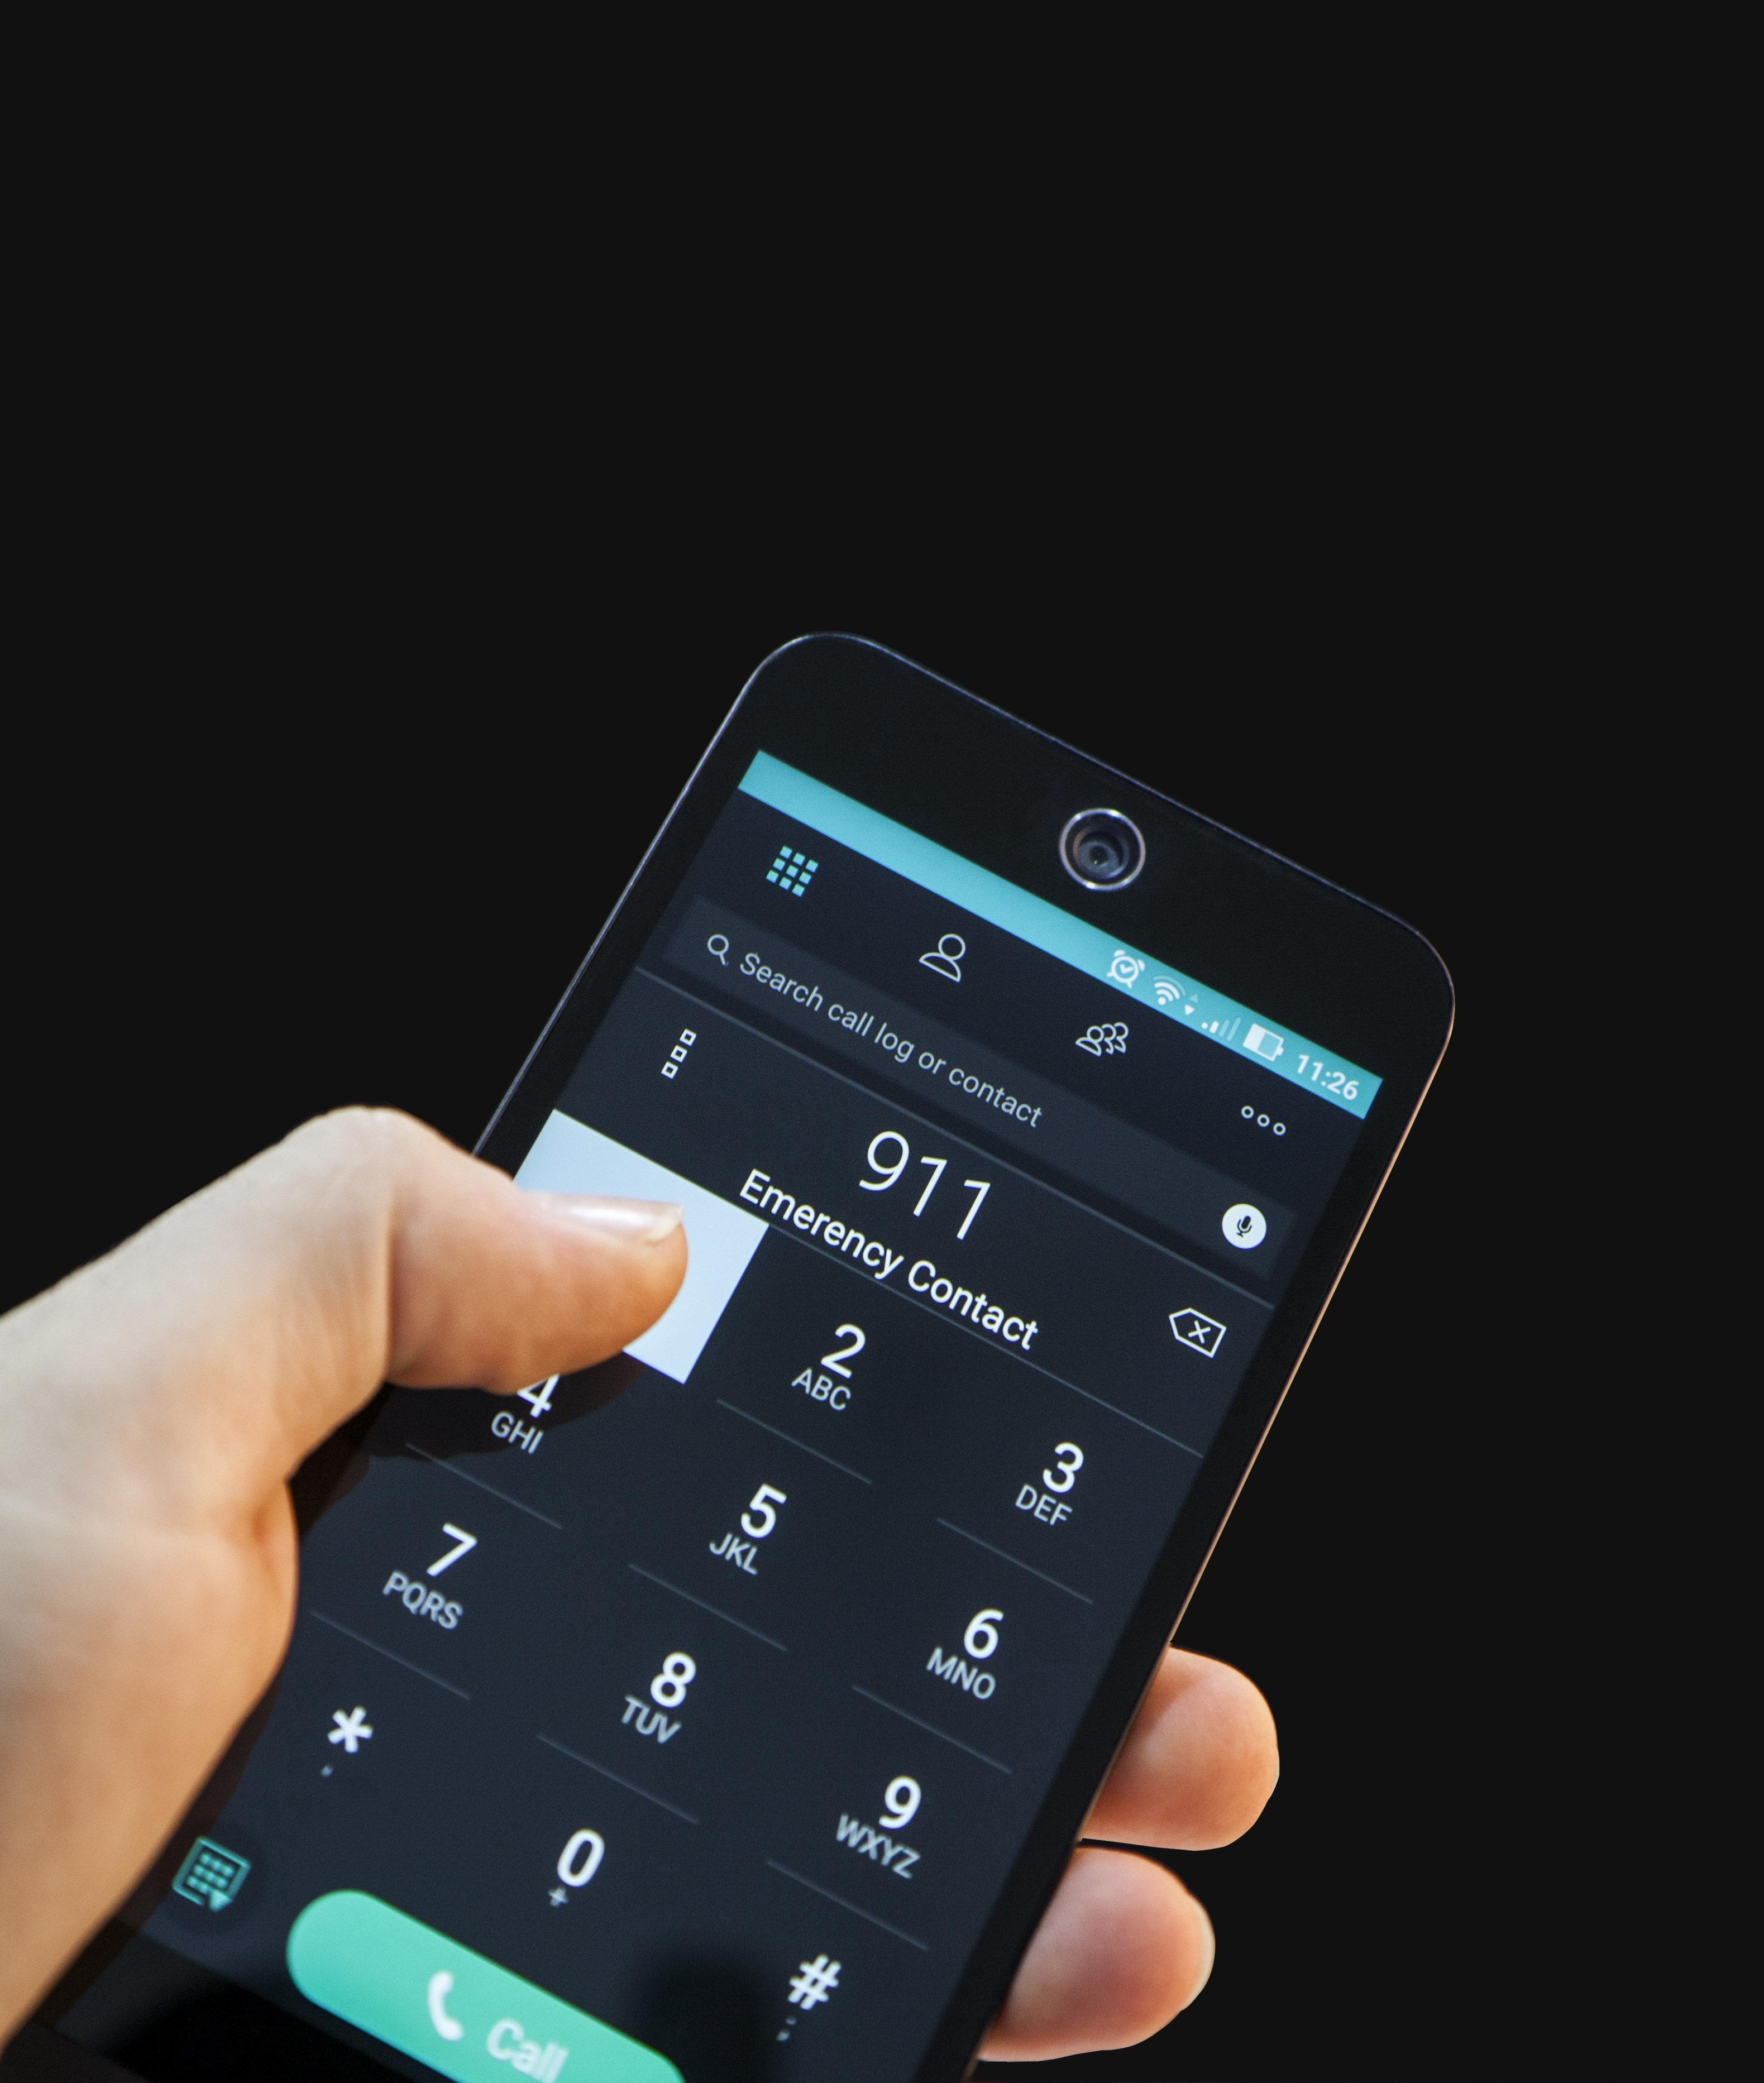 phone to call health service